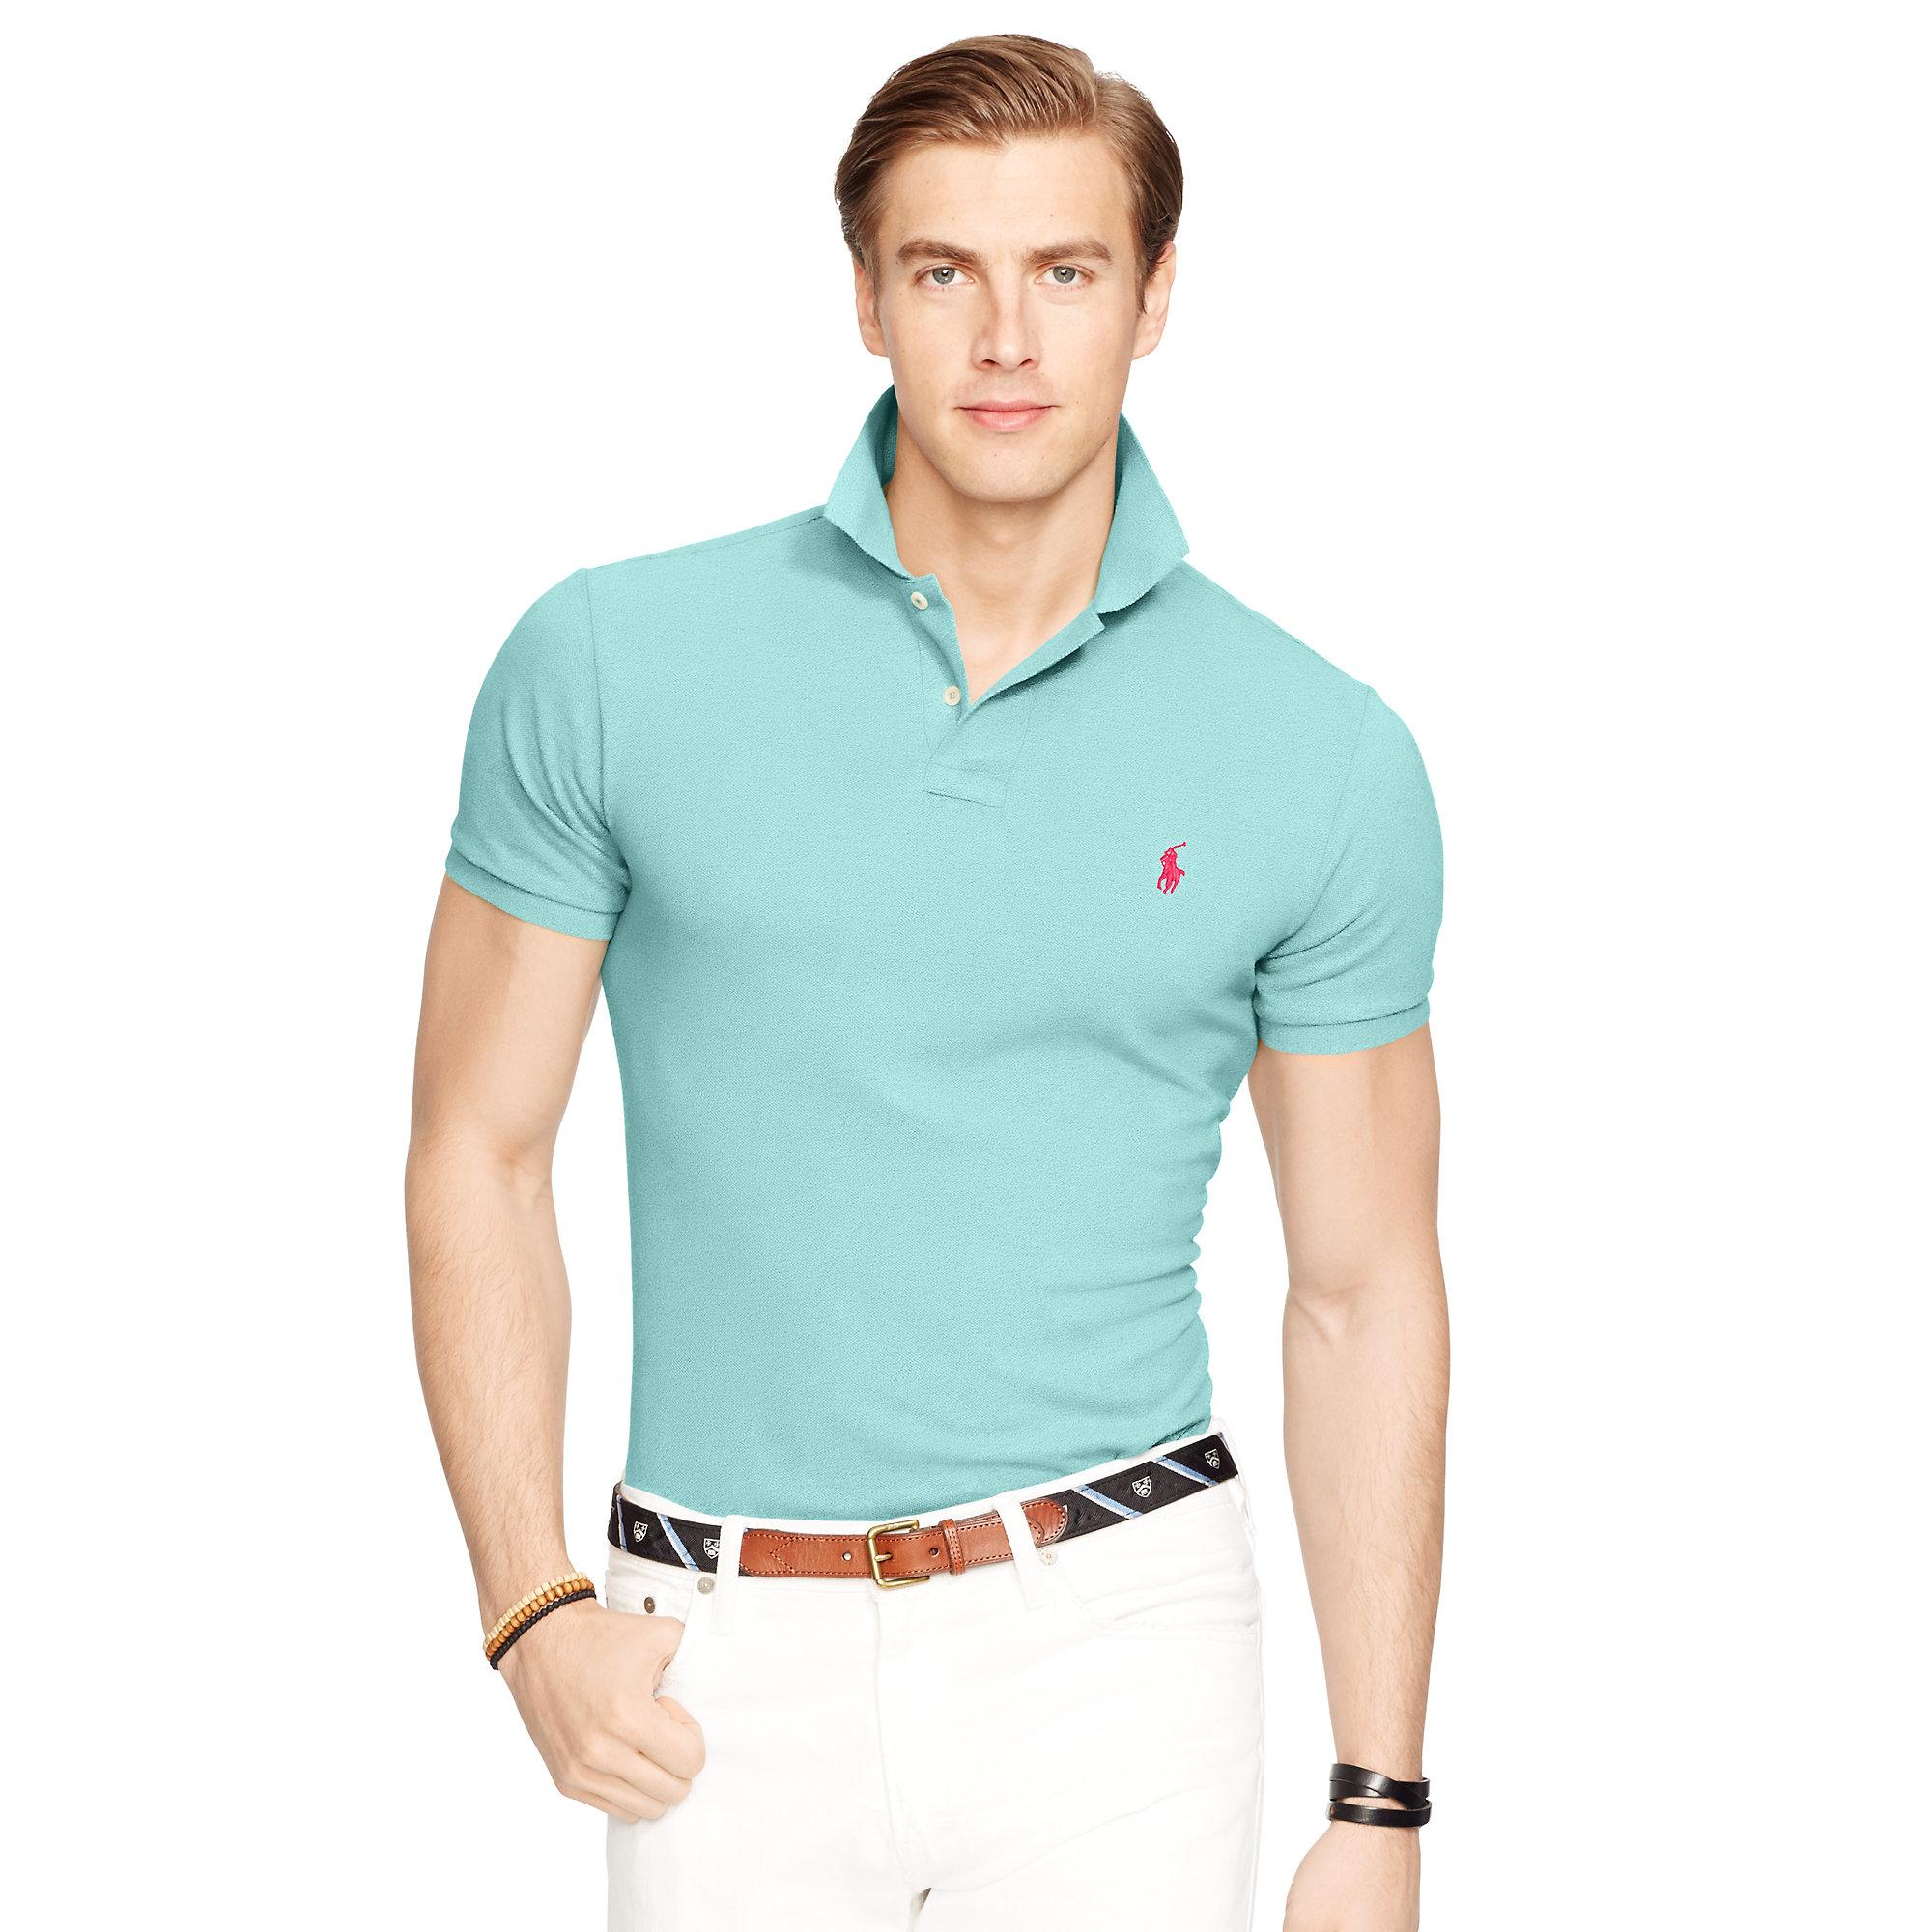 Lyst Polo Ralph Lauren Slim Fit Mesh Polo Shirt In Blue For Men